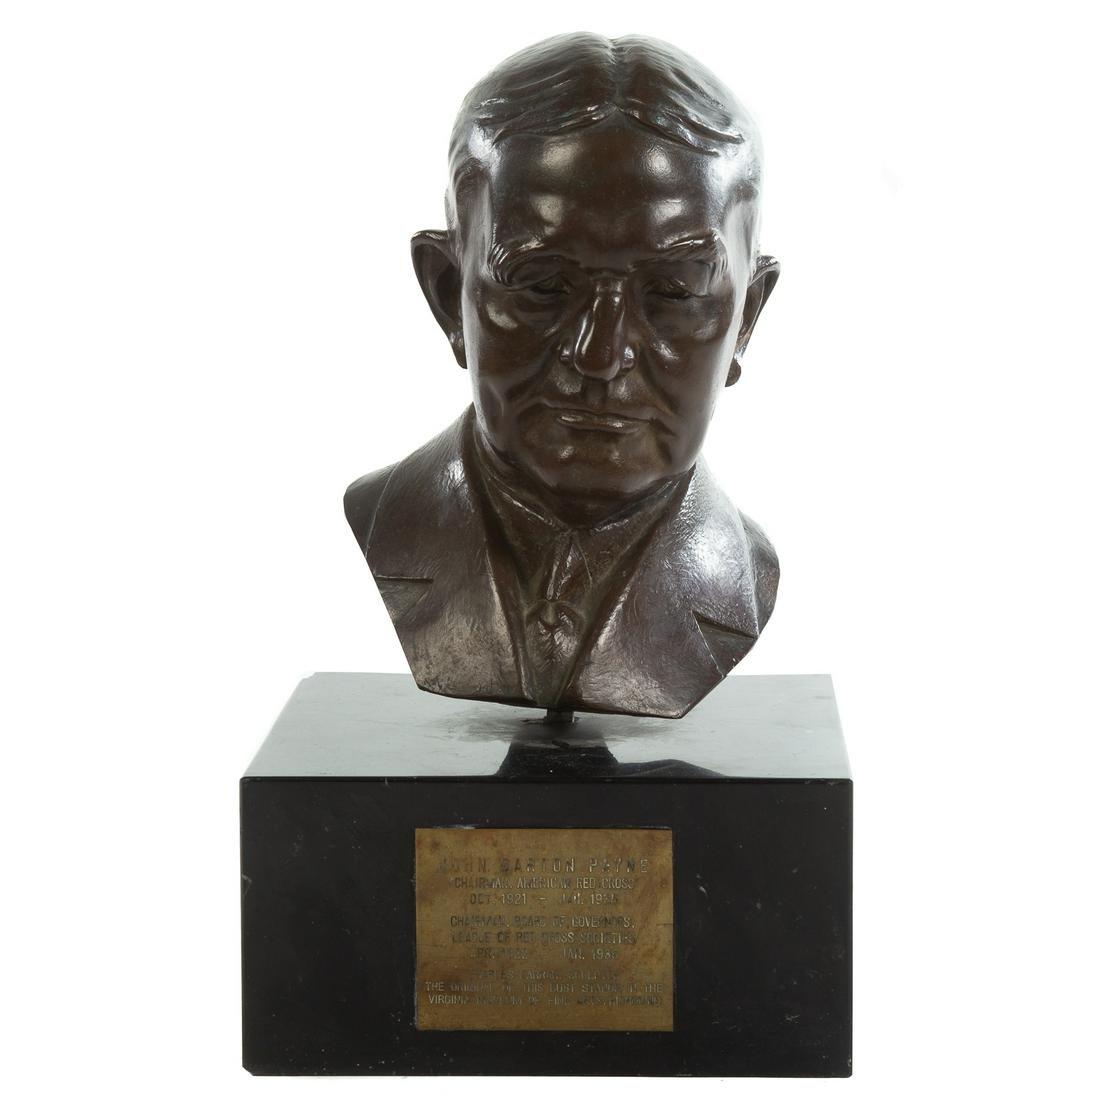 Charles Farrar, Bronze Bust of John Barton Payne